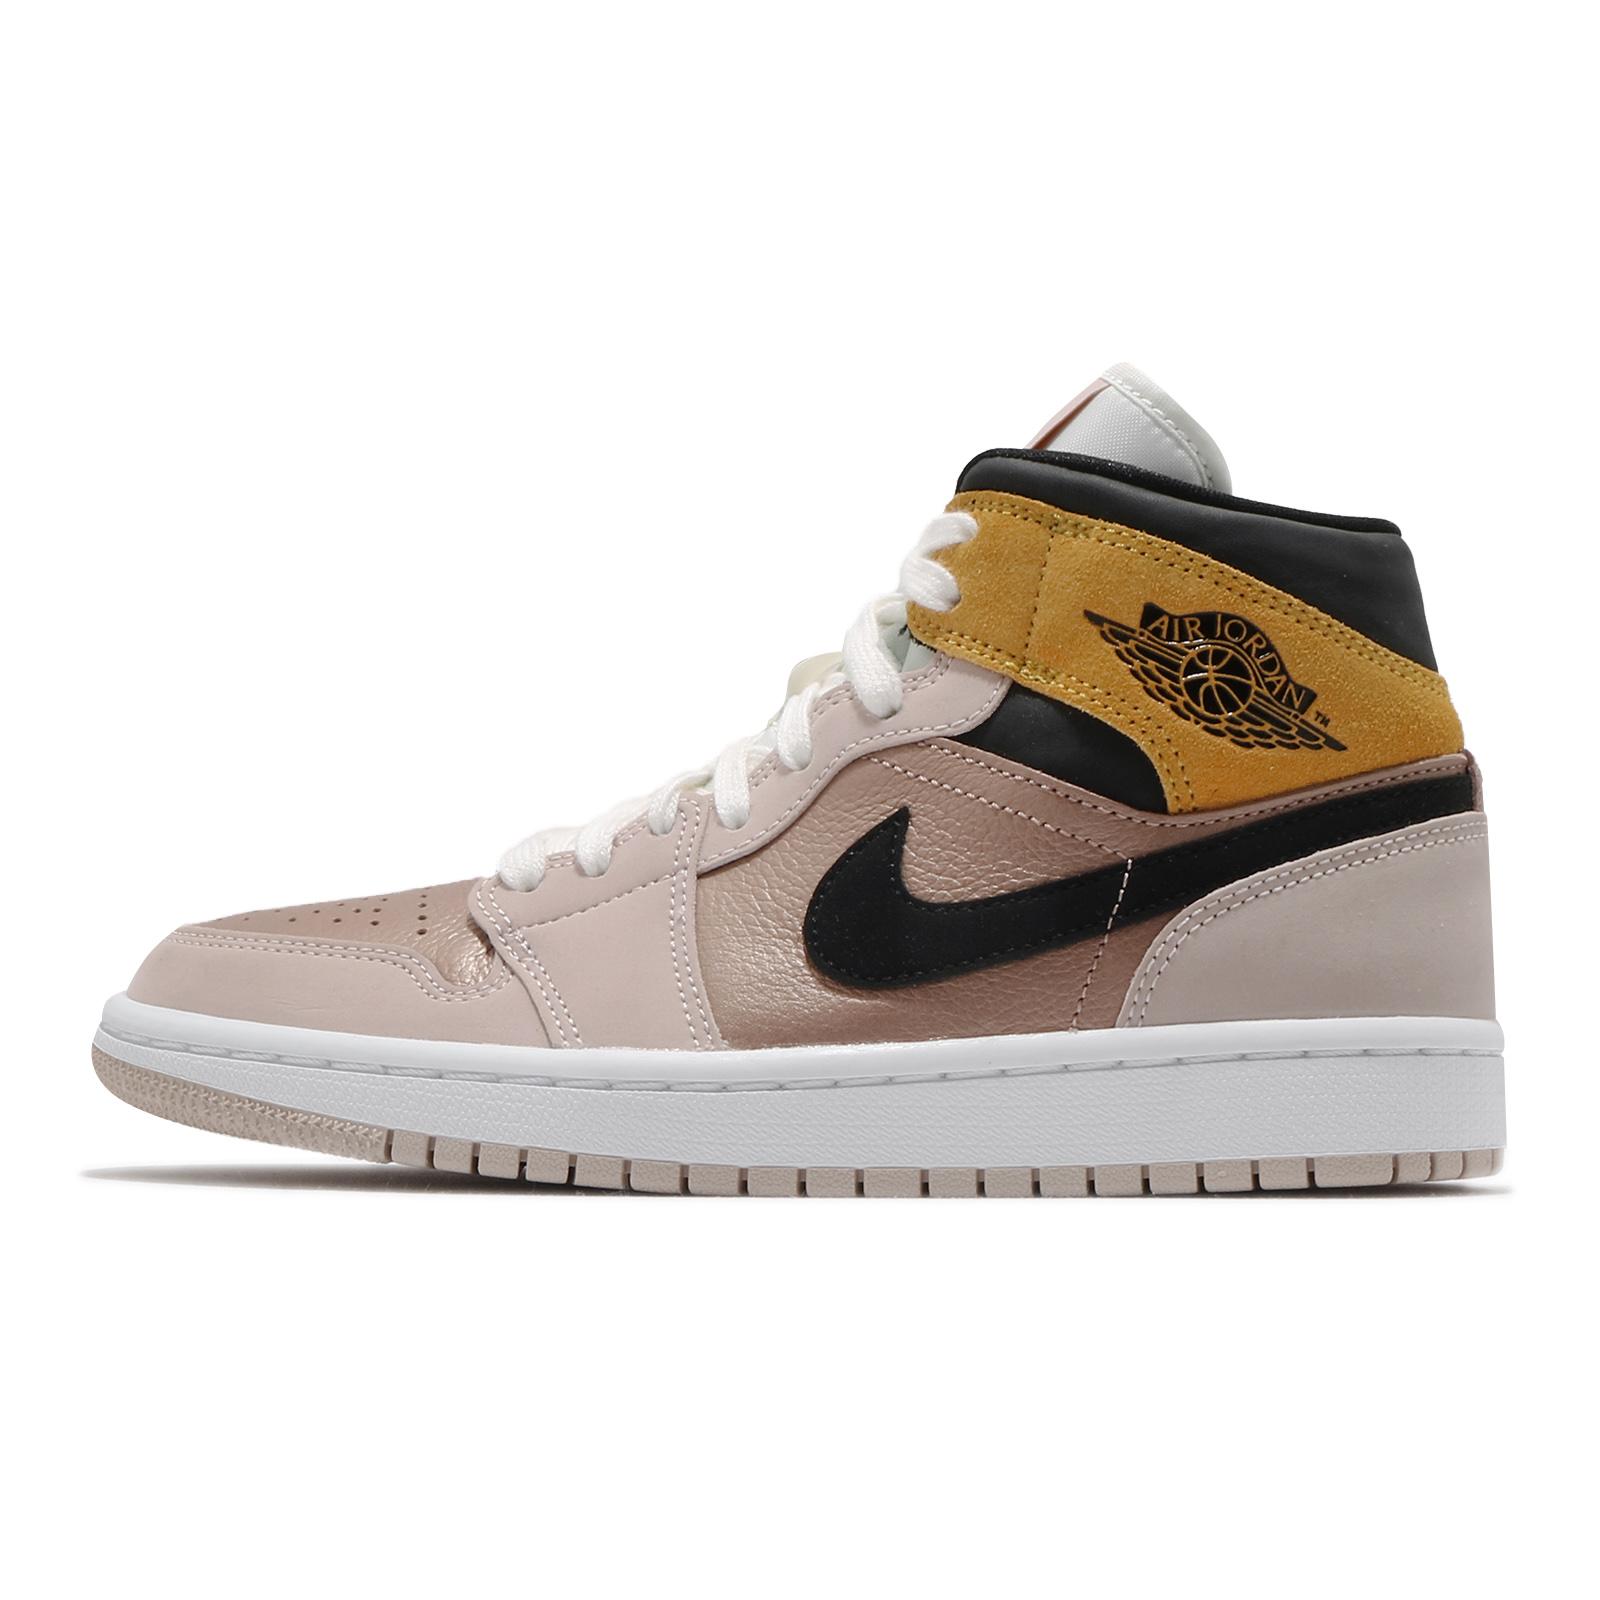 Nike Wmns Air Jordan 1 Mid SE 米白 粉紅 黑 喬丹 1代 女鞋 ACS DD2224200